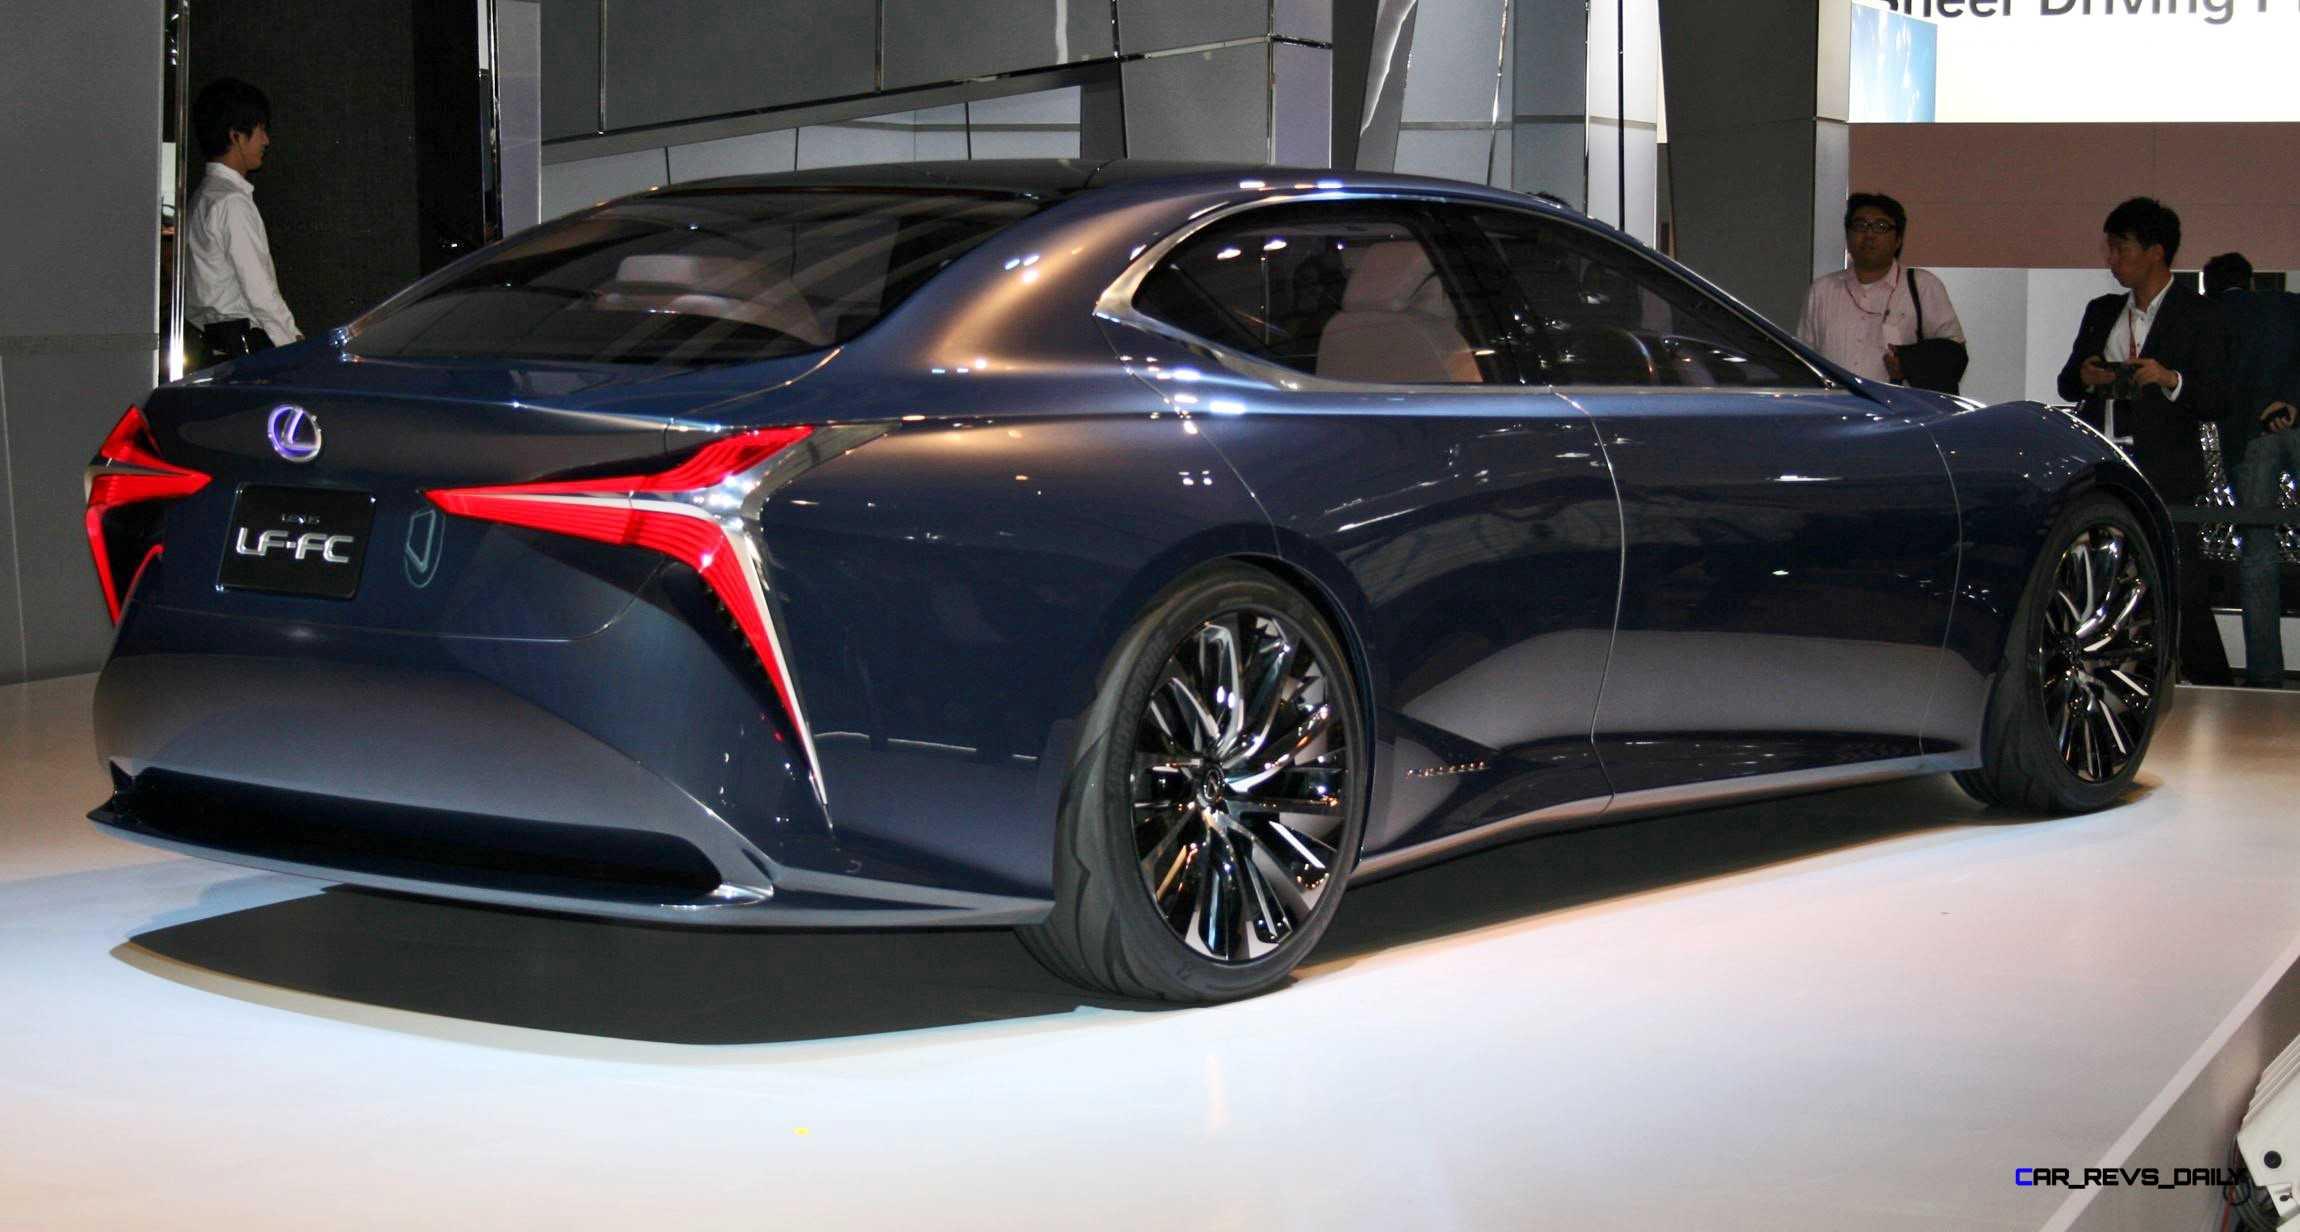 http://www.car-revs-daily.com/wp-content/uploads/2015/10/2015-Lexus-LF-FC-Flagship-Concept-1.jpg